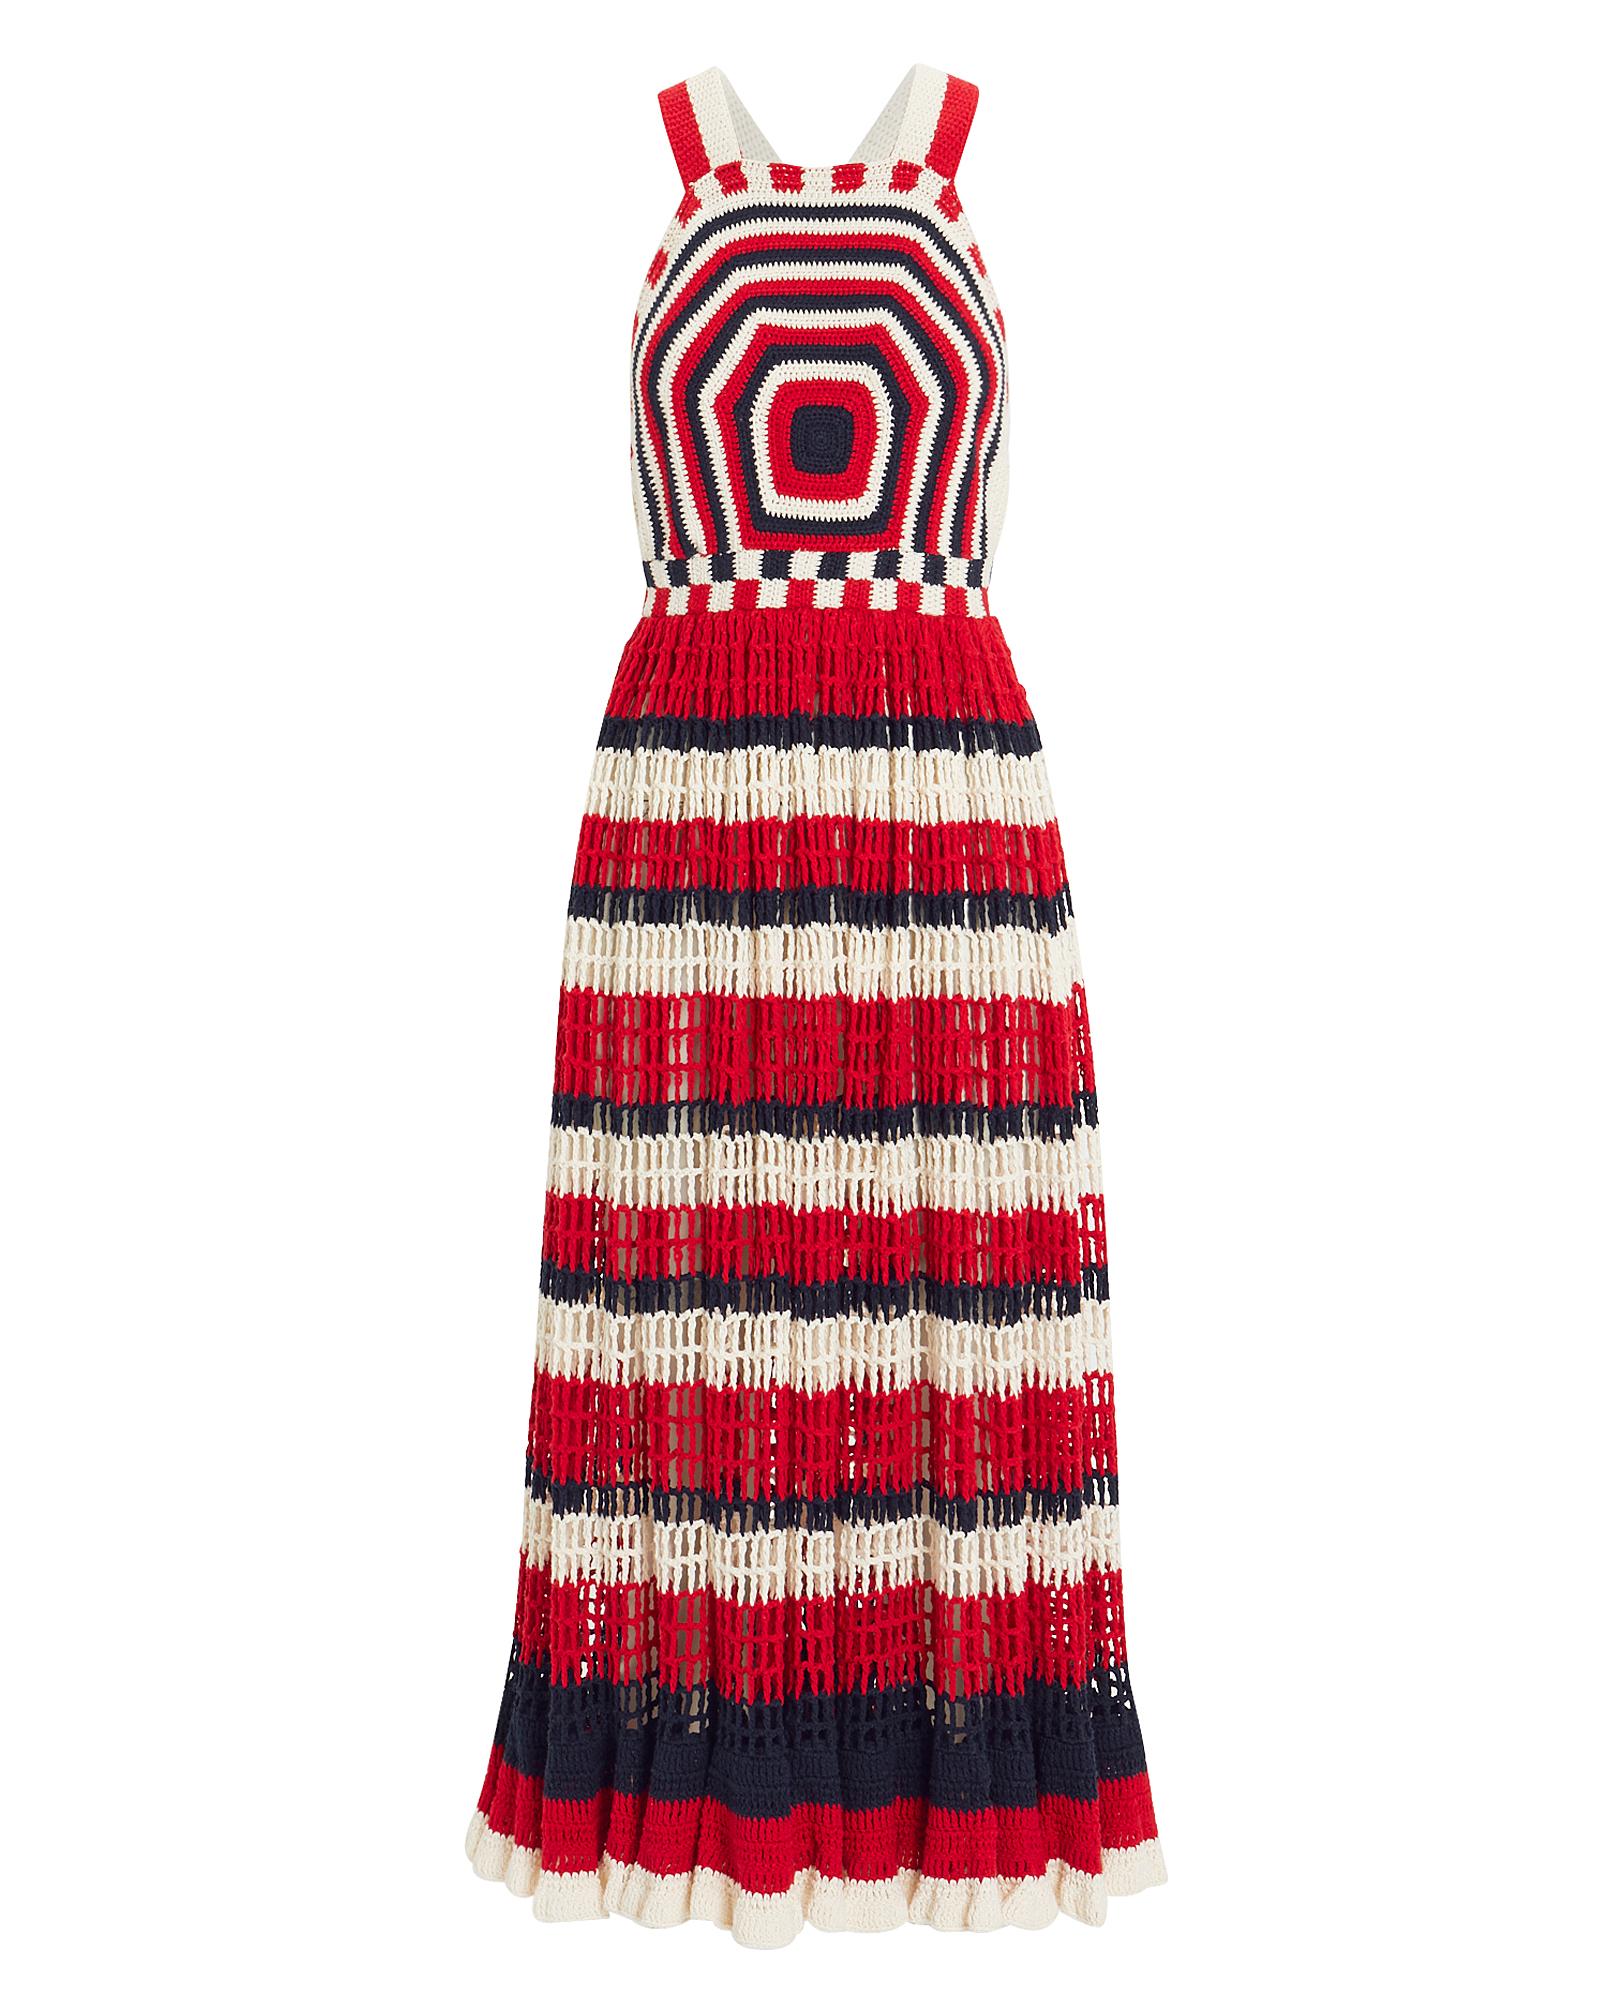 Paz Crochet Dress by Ulla Johnson